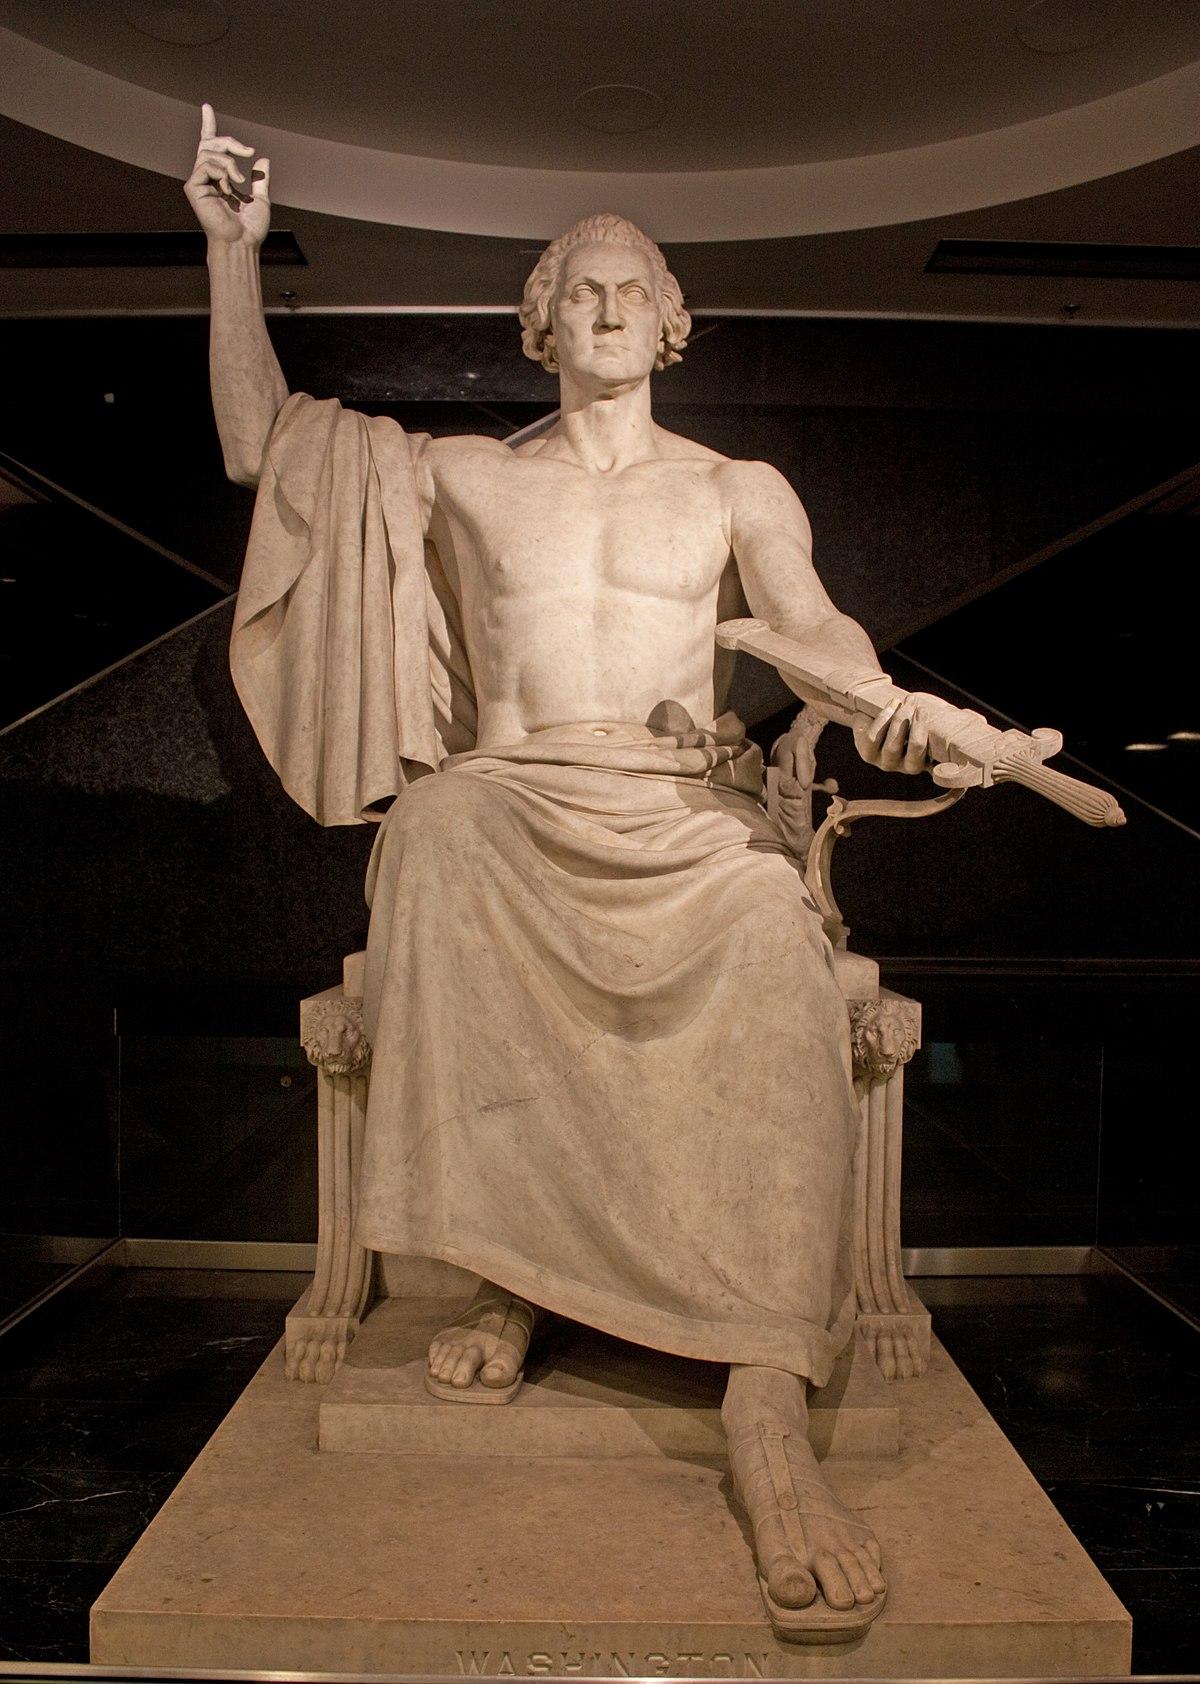 джордж вашингтон зевс фото статуя